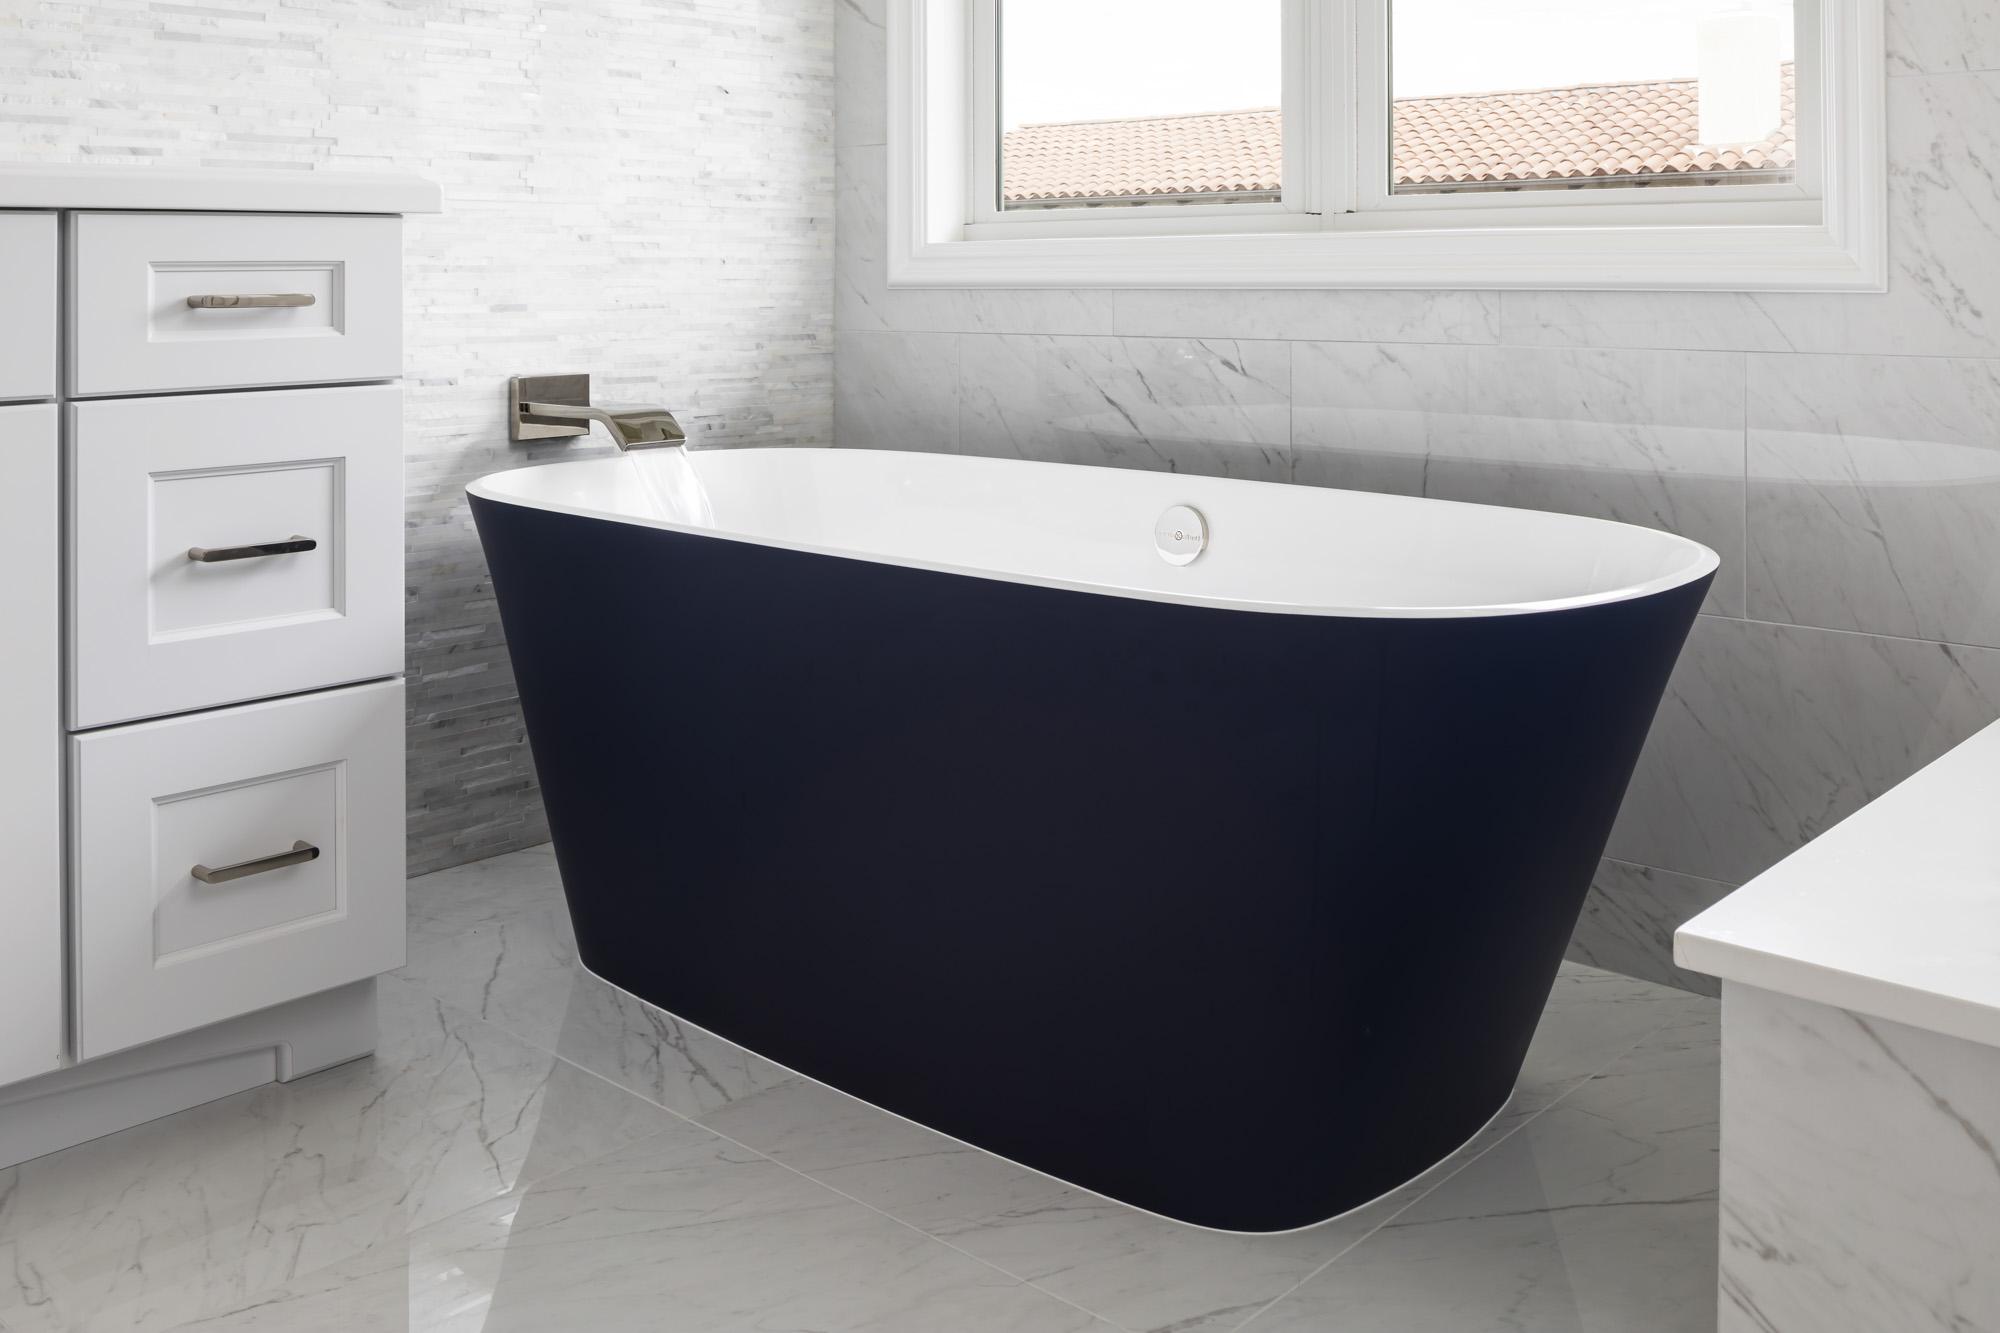 Bold-color-tub-in-white-bathroom-remodel